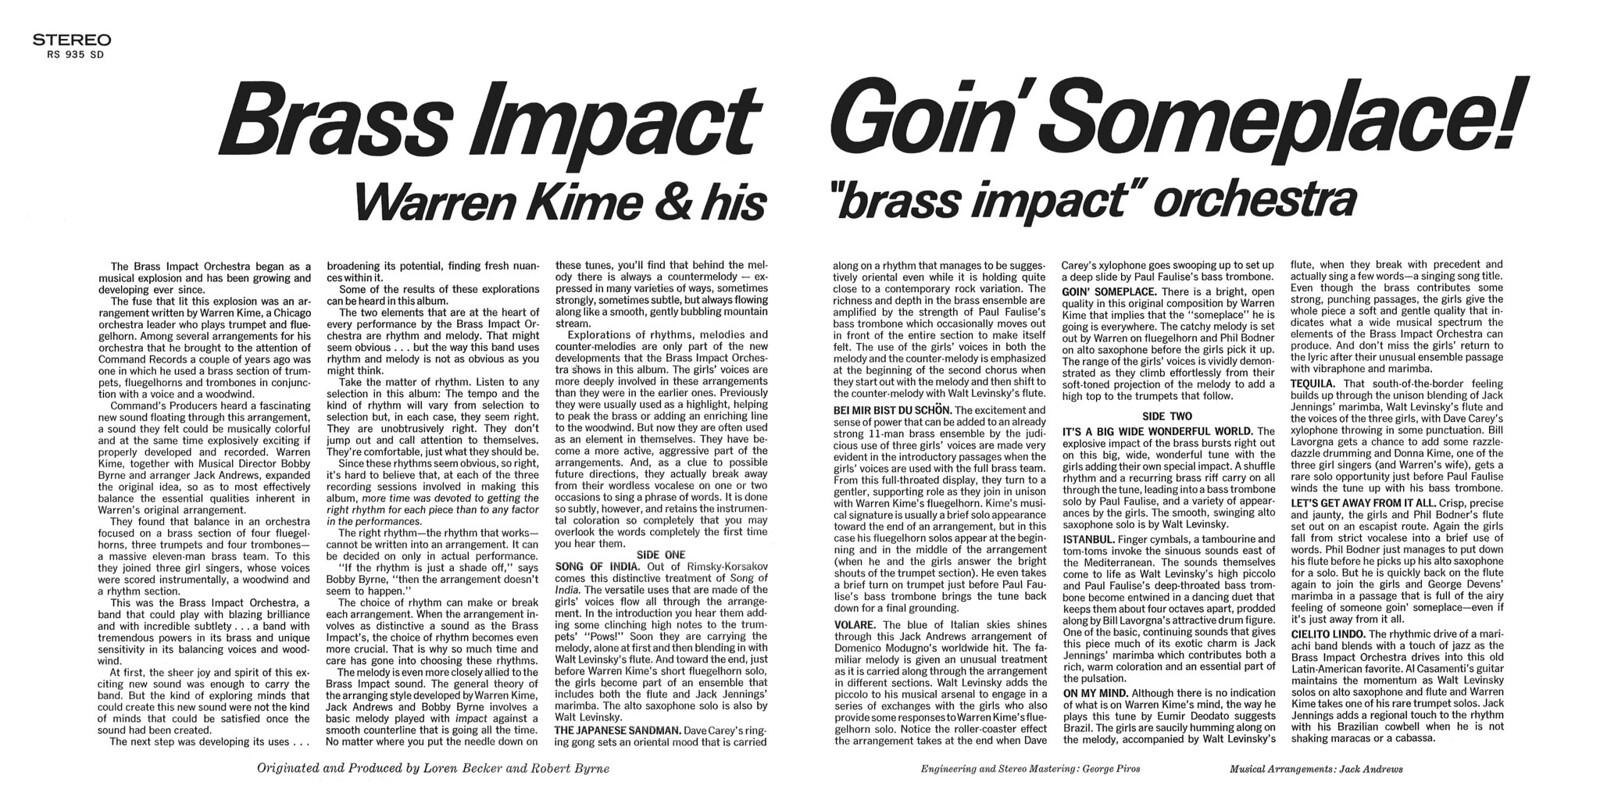 Warren Kime - Brass Impact, Going Someplace